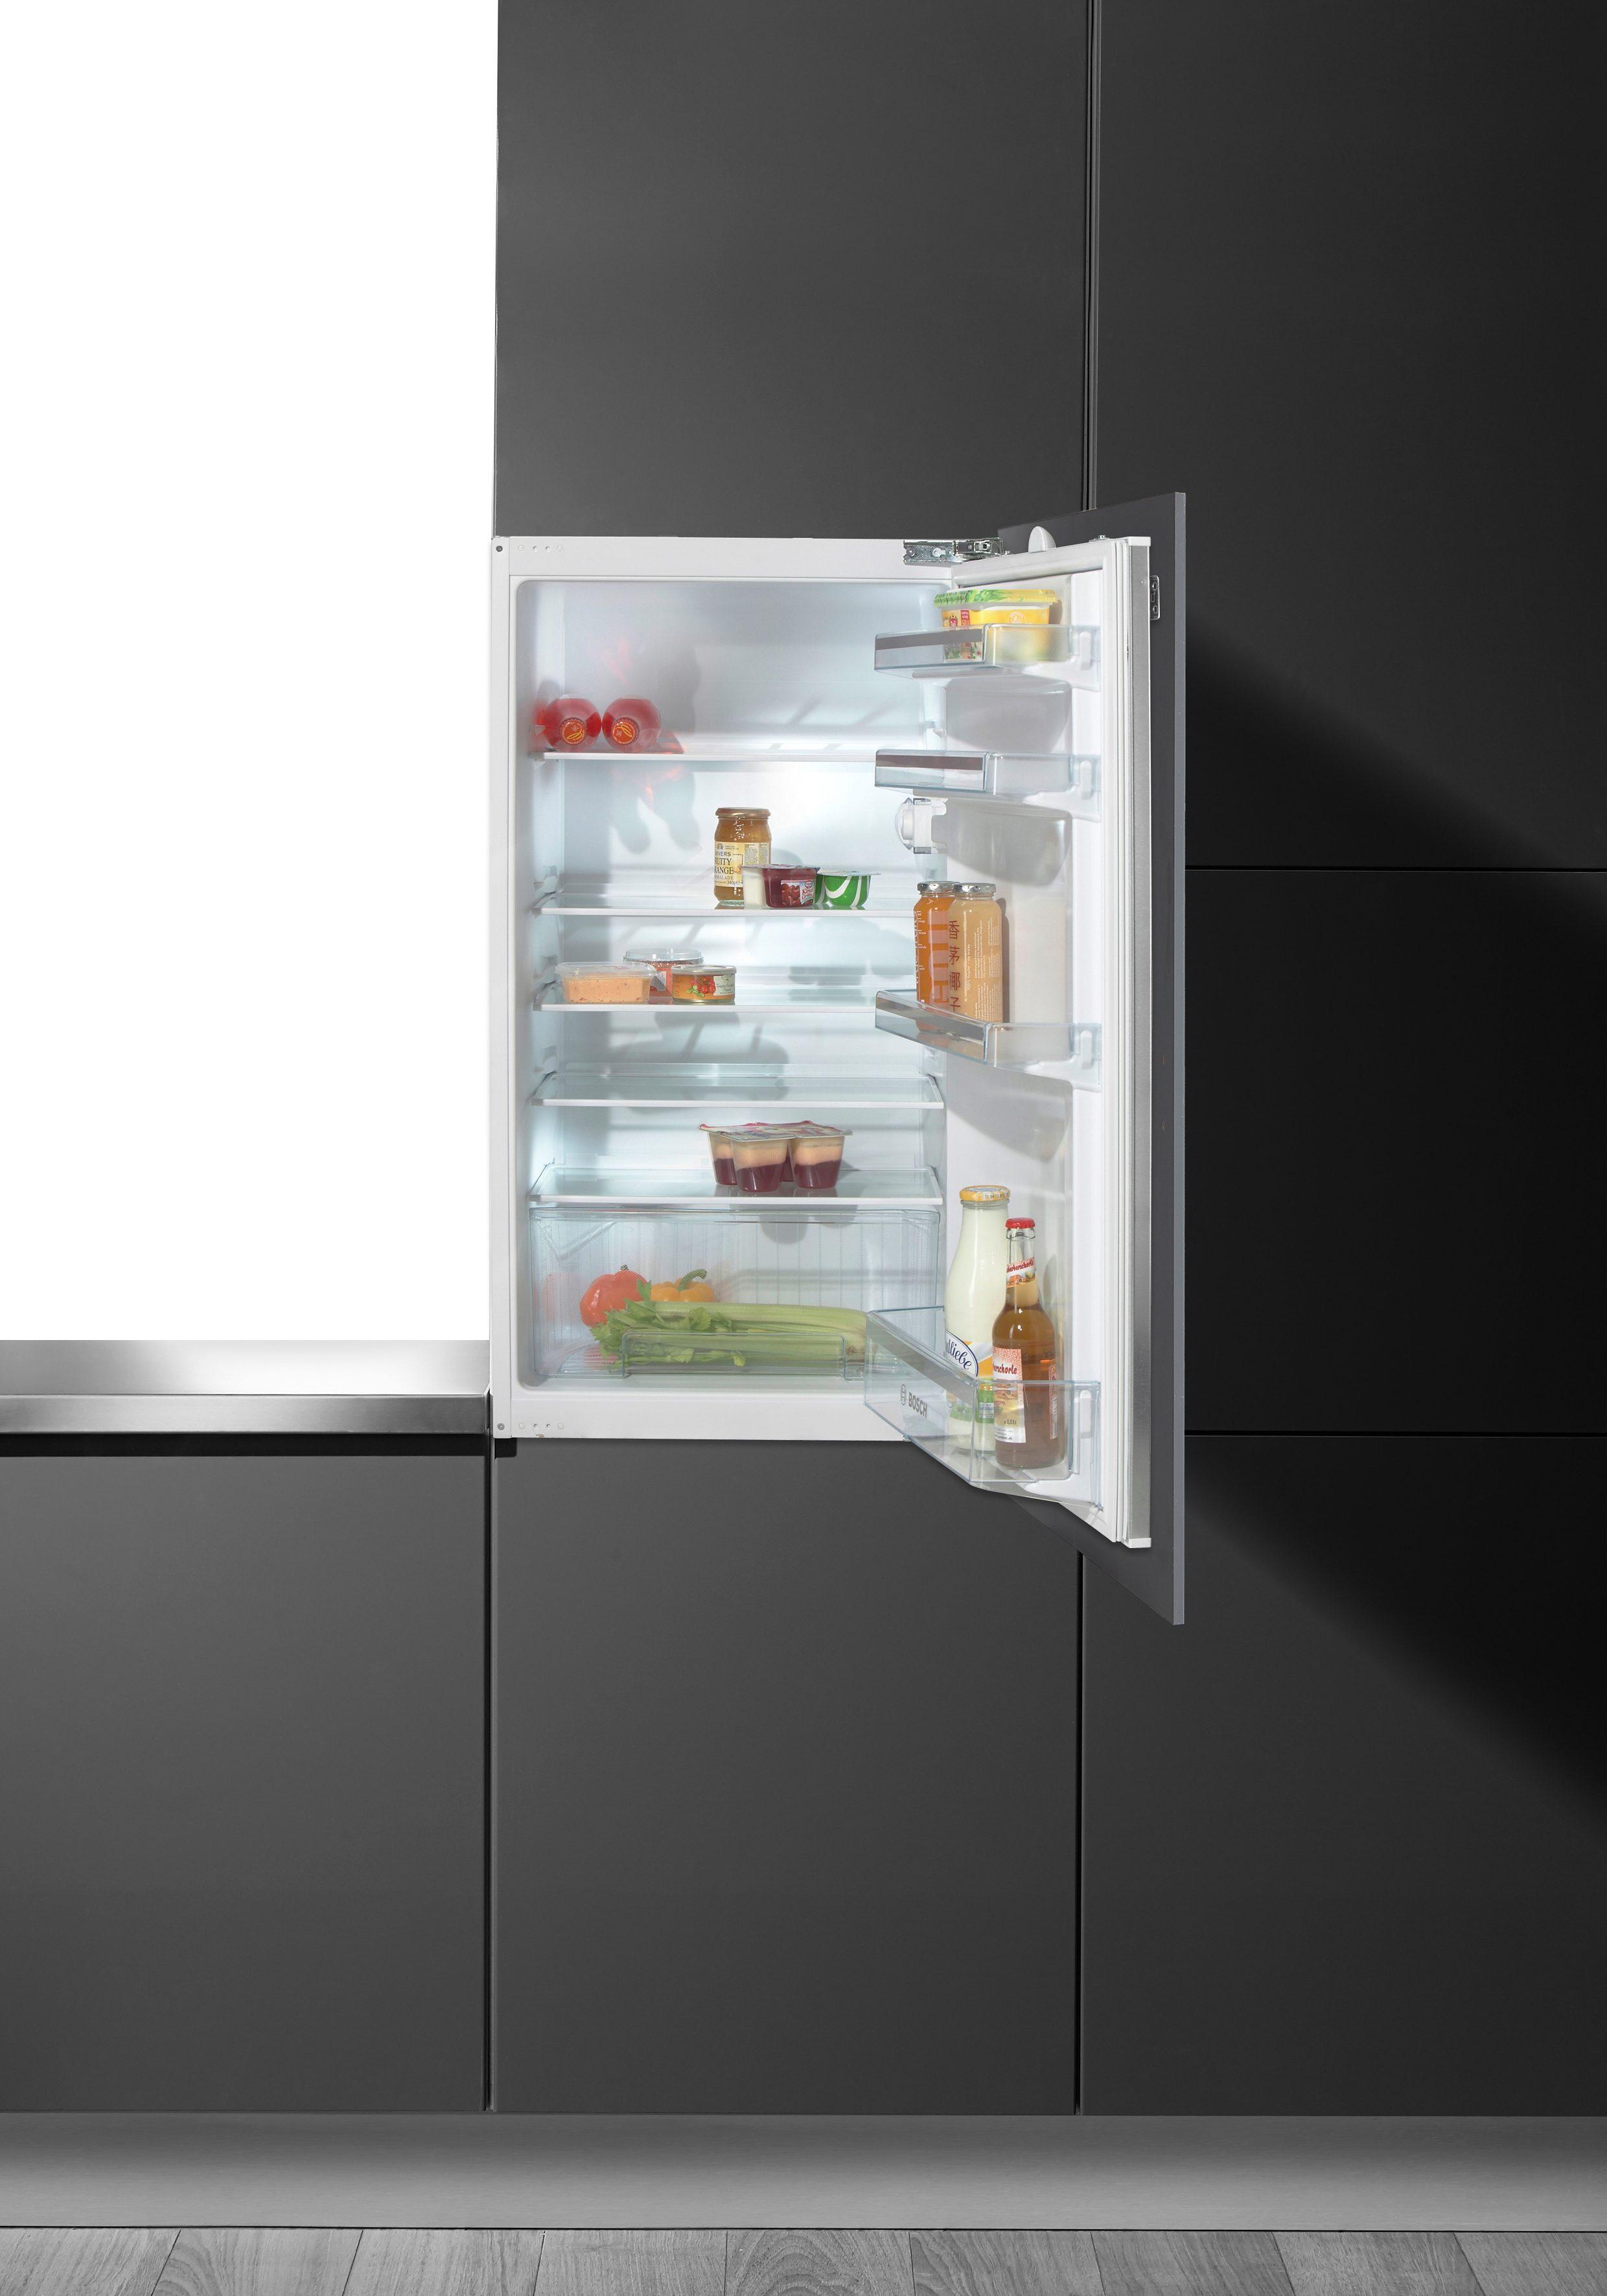 Bosch integrierbarer Einbau-Kühlschrank KIR20V60, A++ 102,5 cm